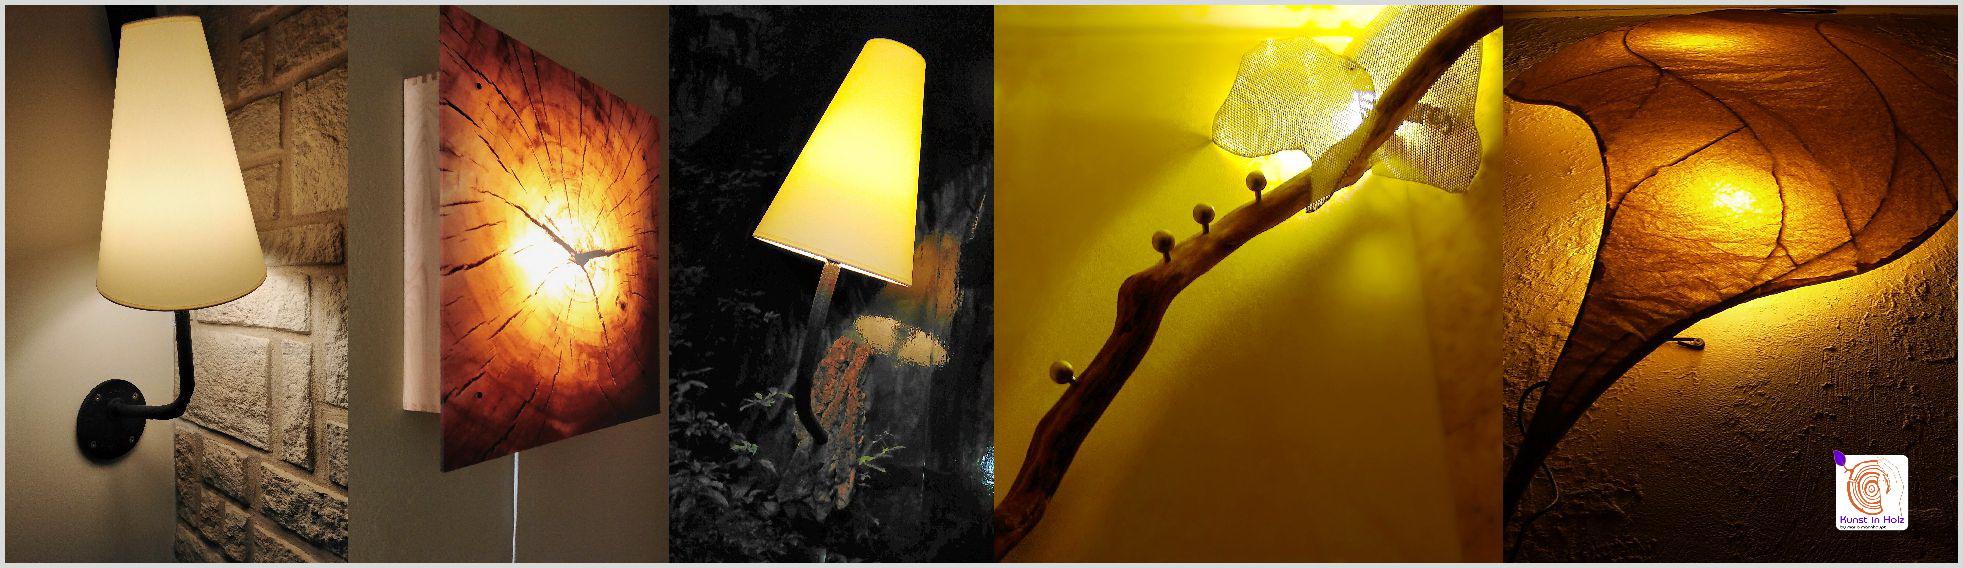 Wandlampe made by Mario Mannhaupt